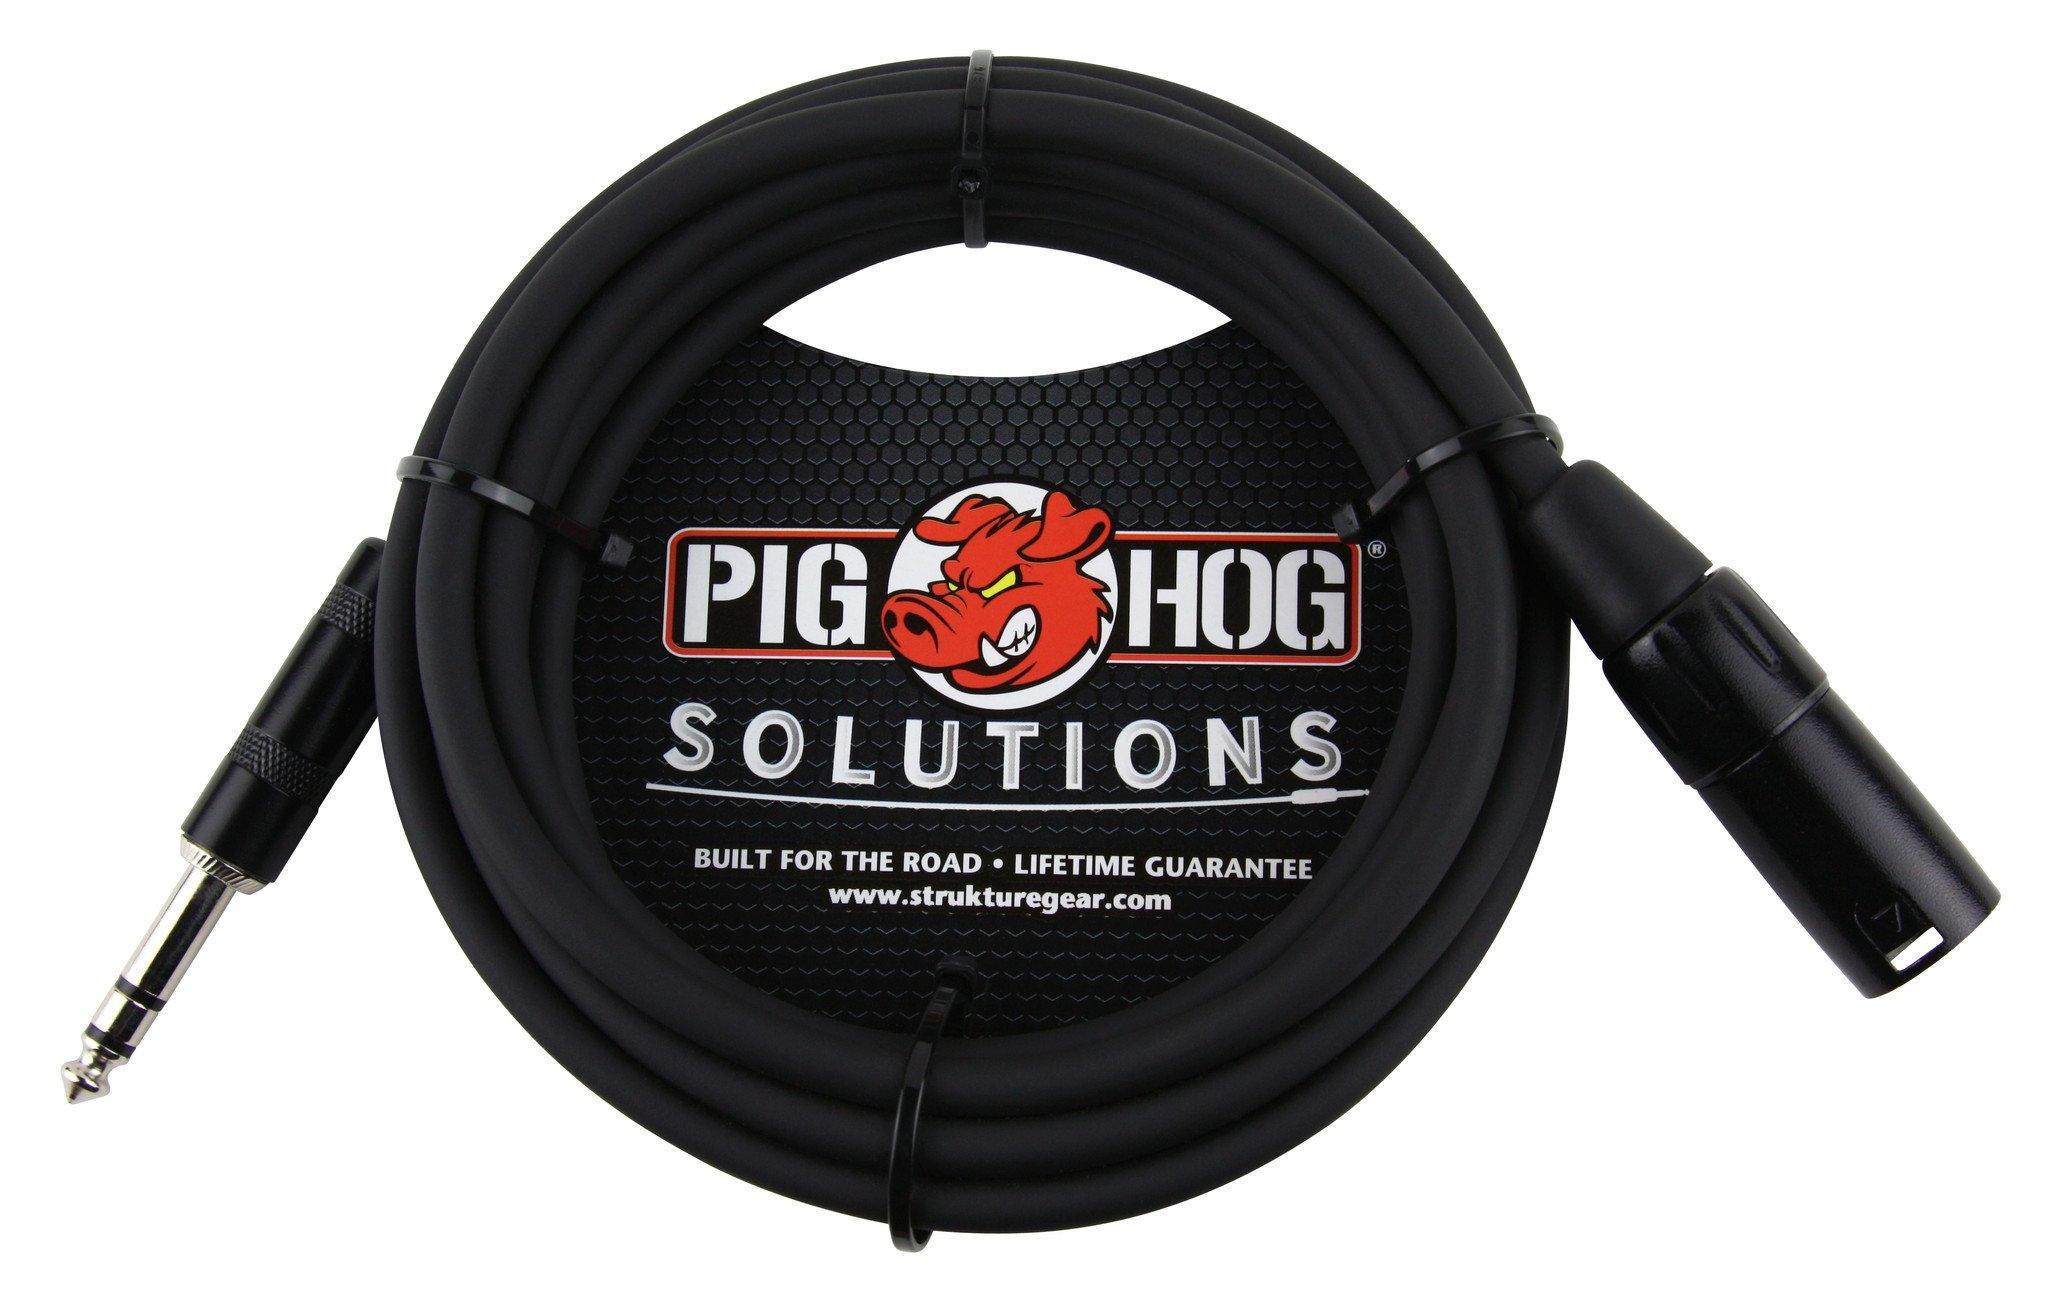 Pig Hog Solutions - 25ft TRS(M)-XLR(M) Balanced Cable